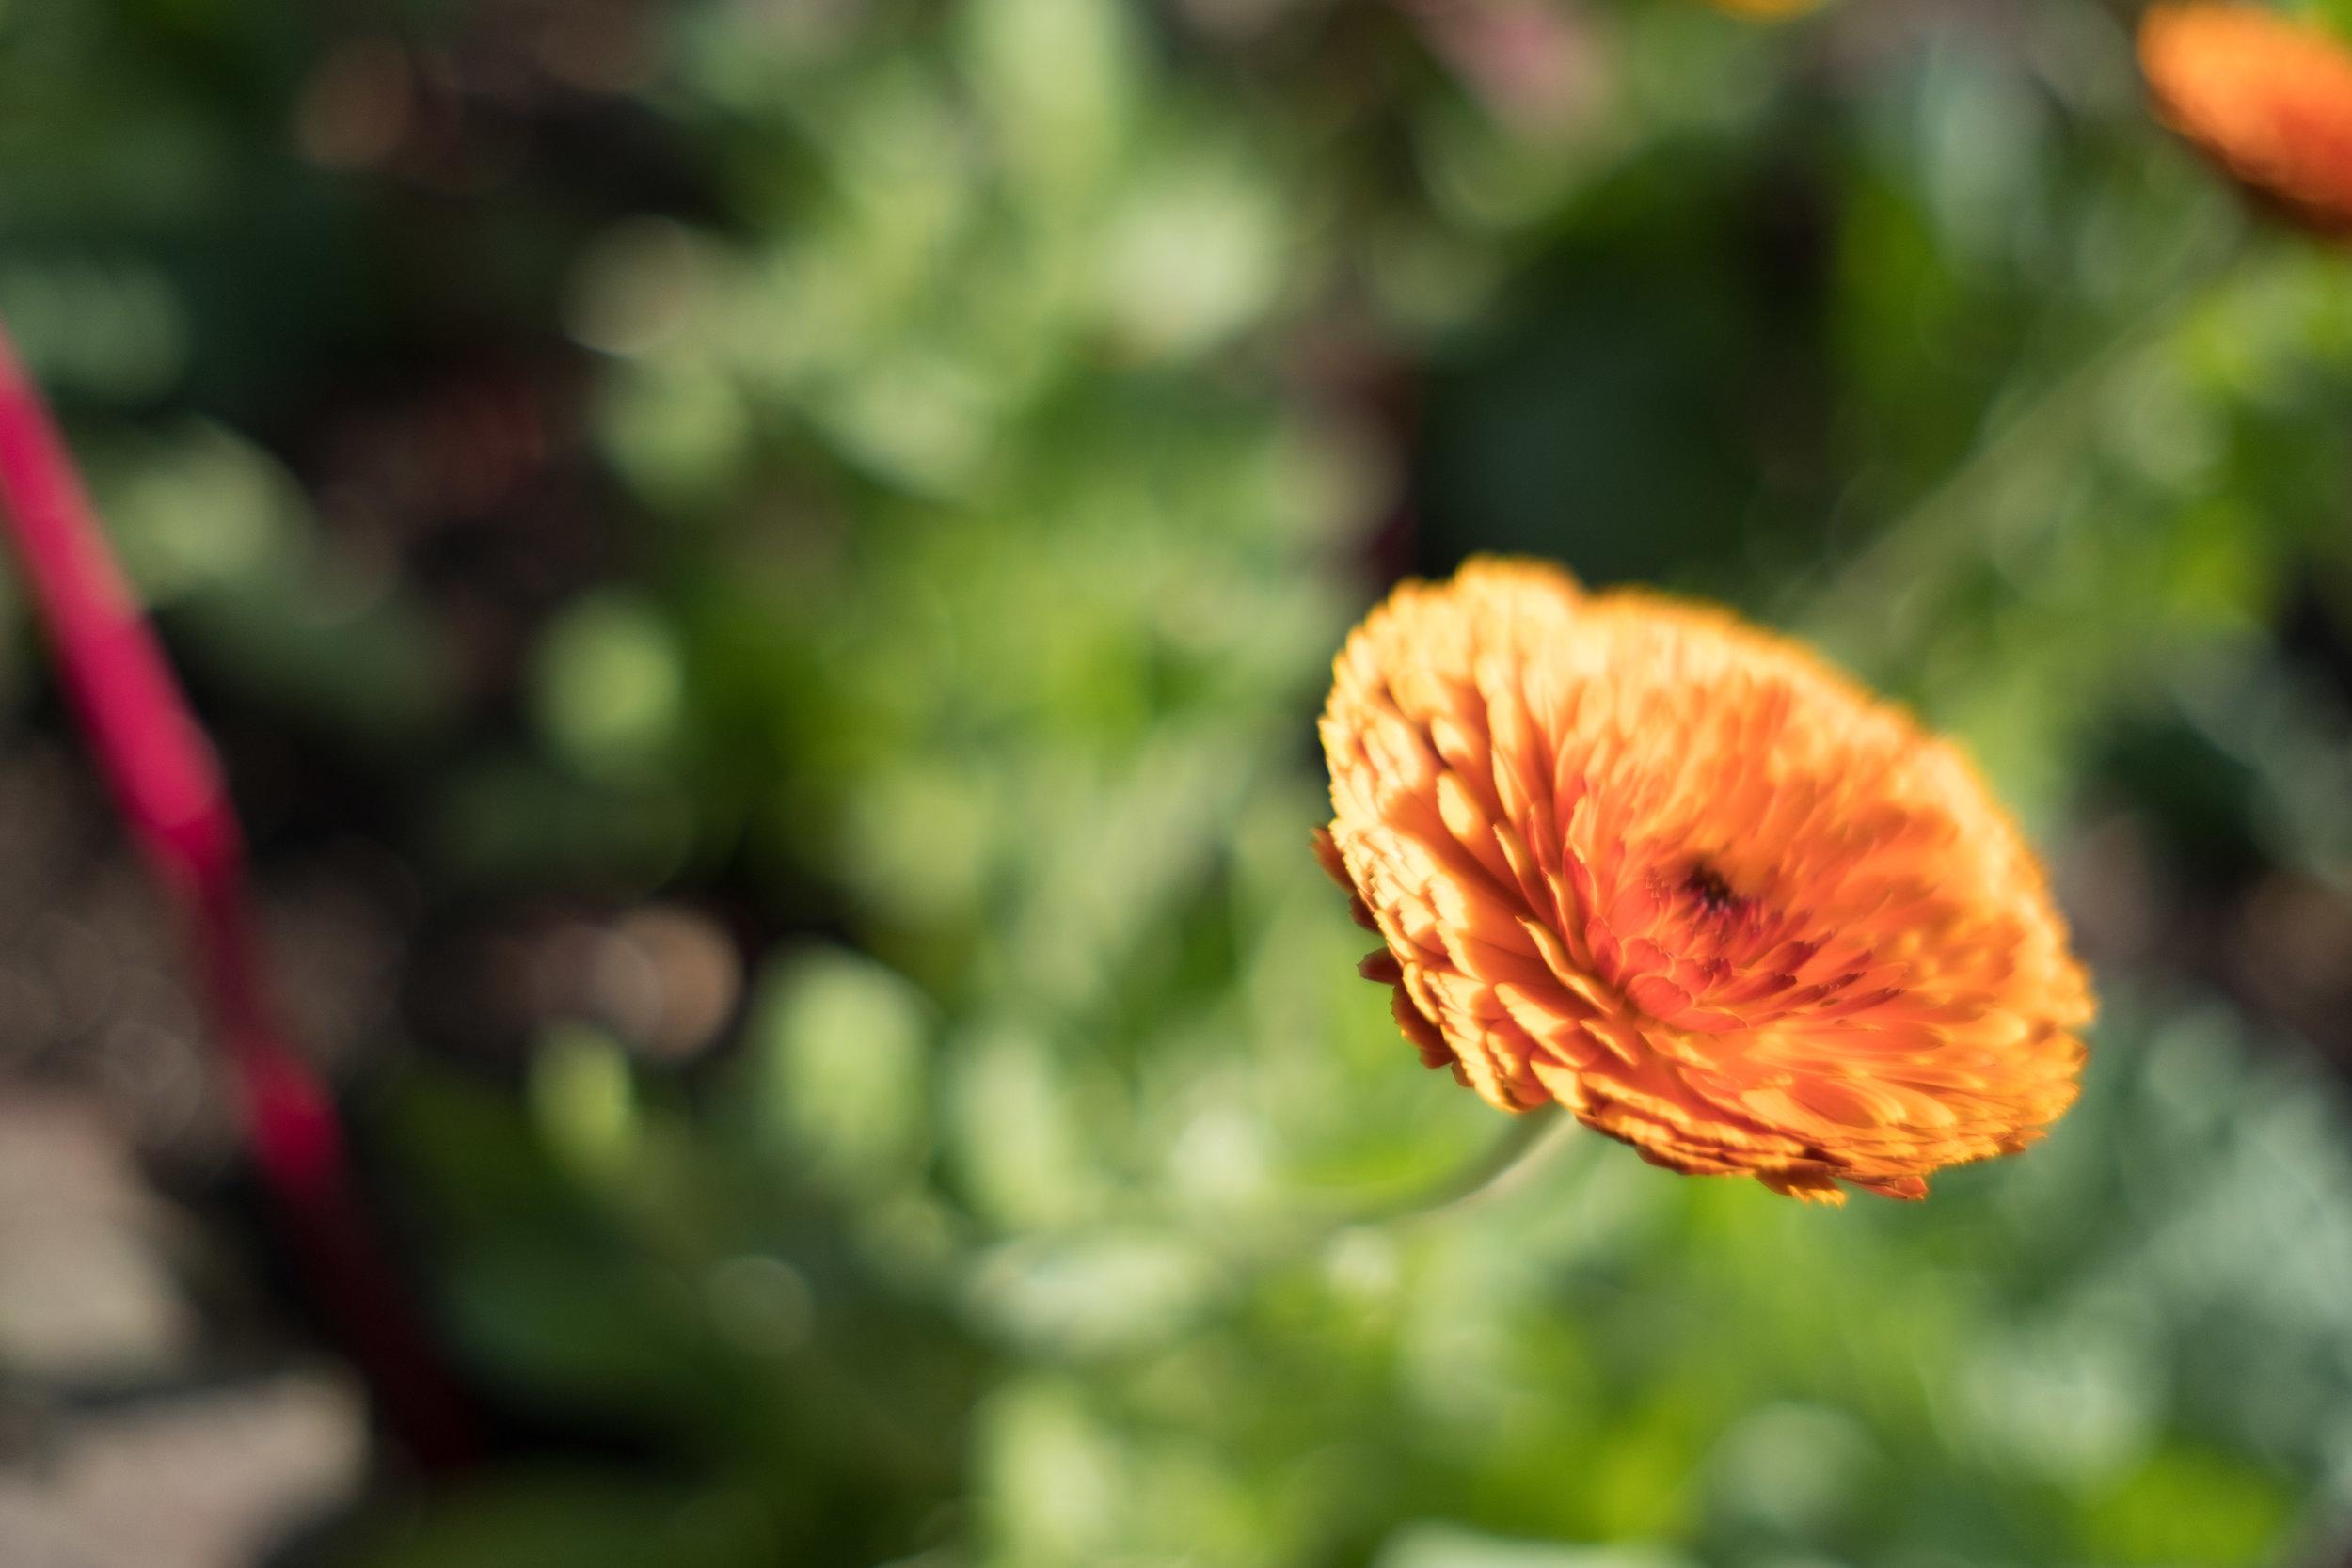 F2, focuses on left-hand petals